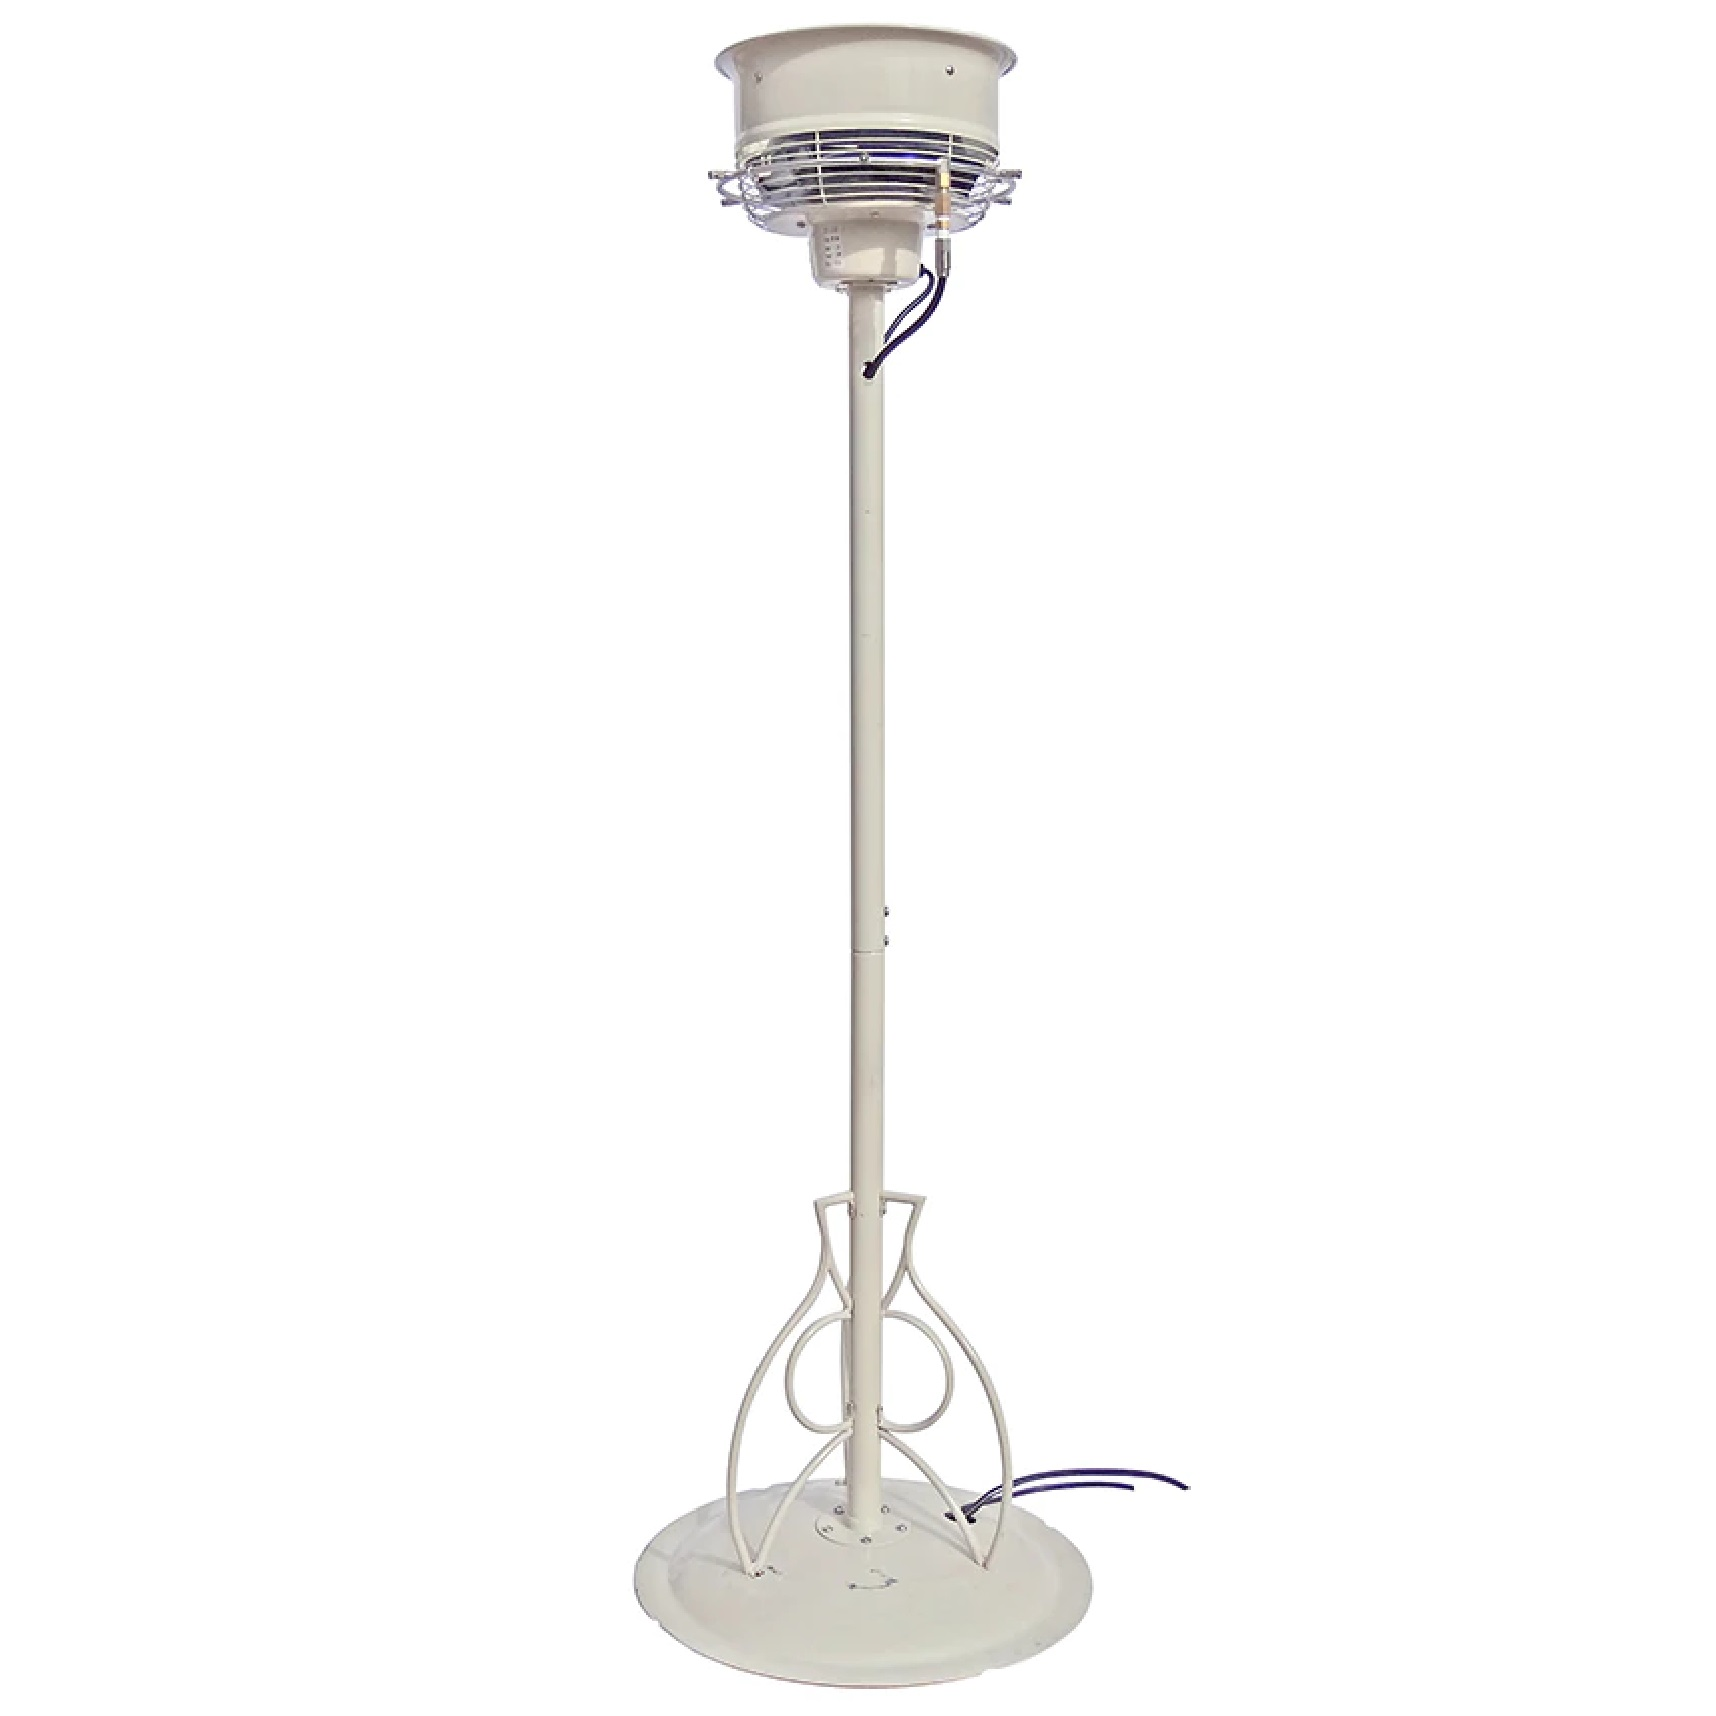 CentraMist Centrifugal Misting Fan Tower